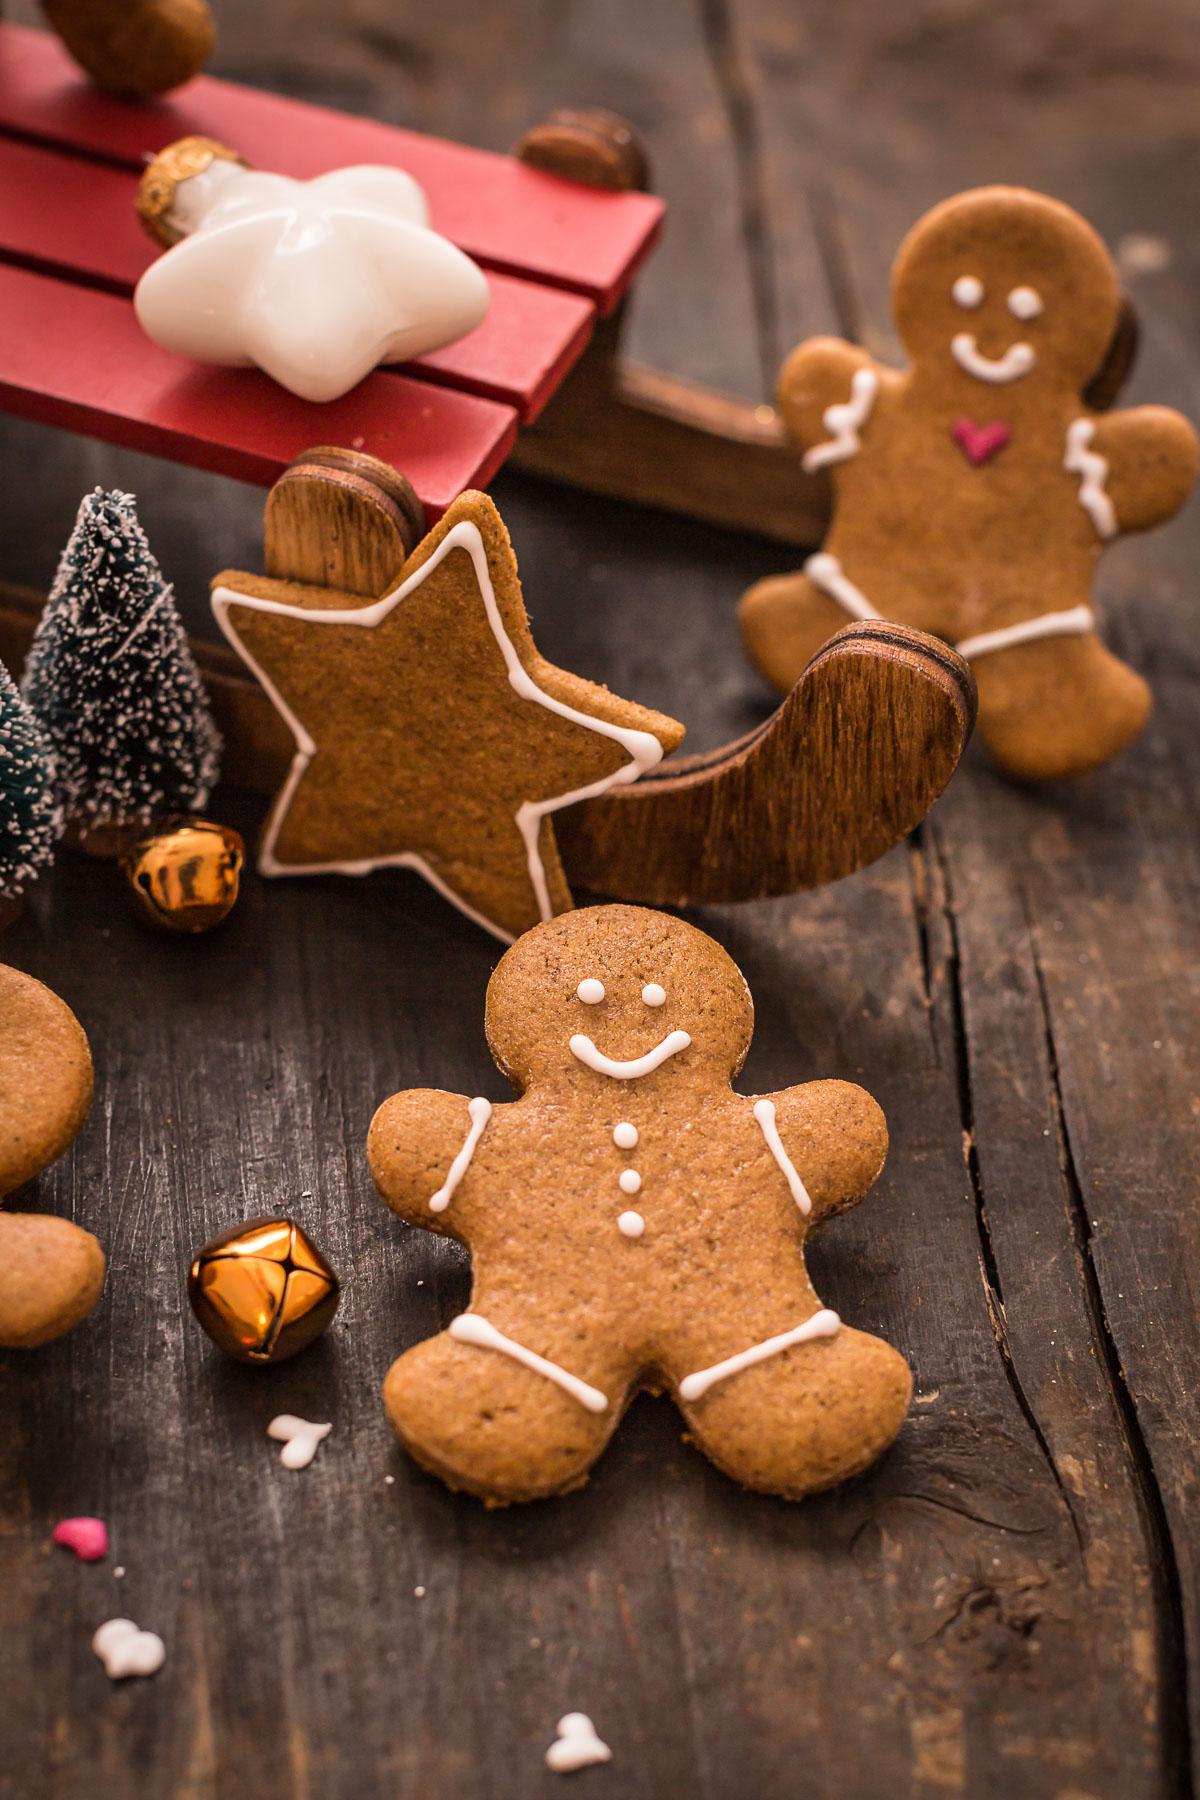 delicious vegan gingerbread man vegani - biscotti pan di zenzero vegani croccanti leggeri e friabili #vegan gingerbread senza burro